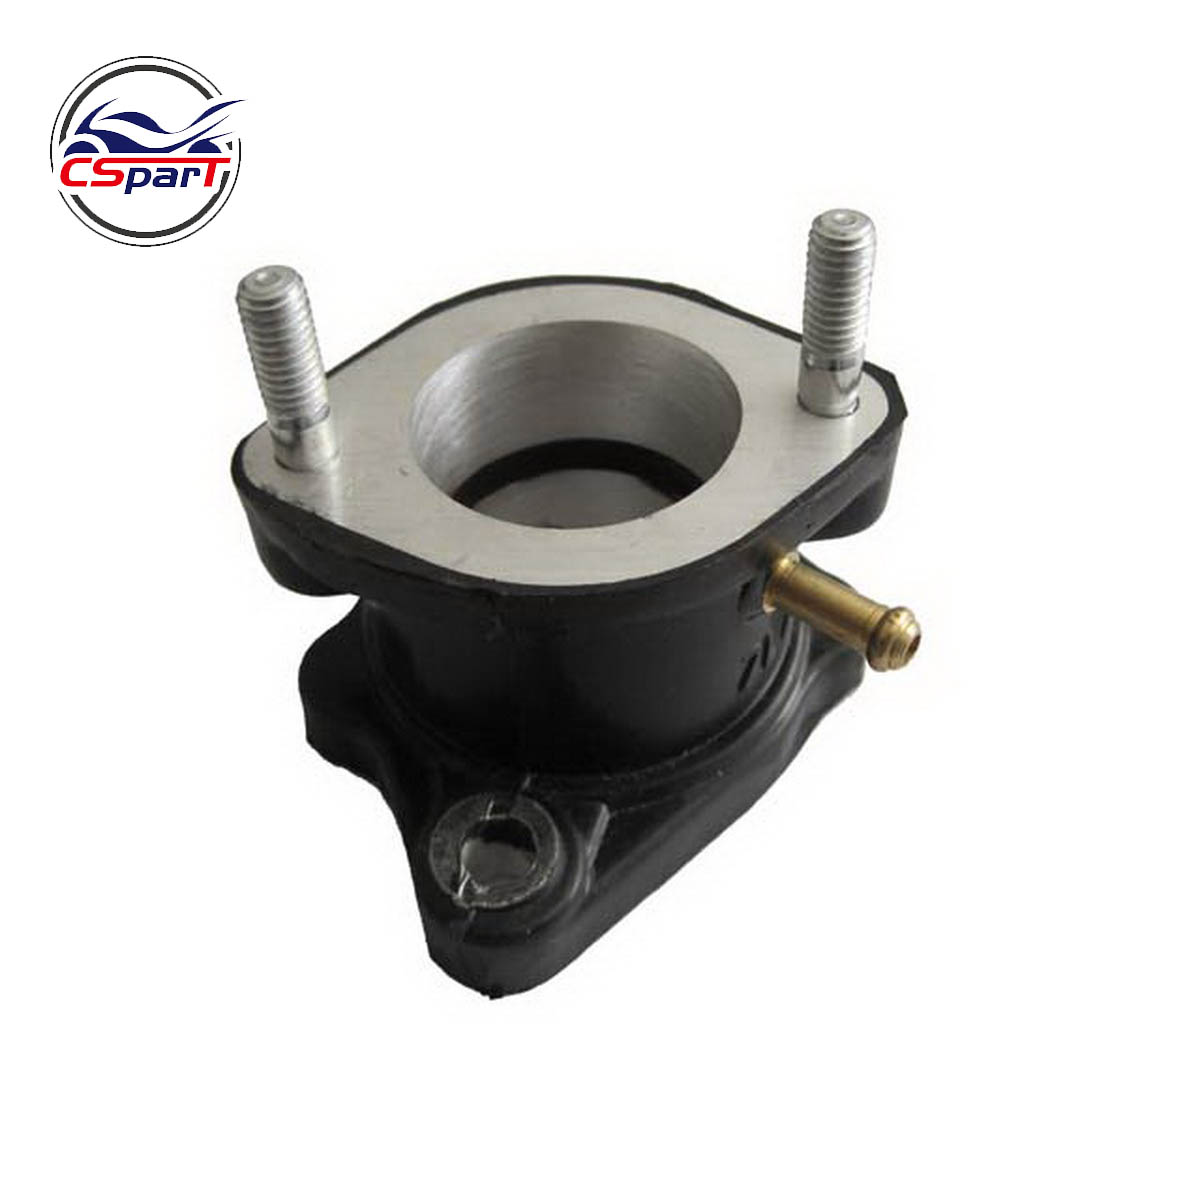 30MM PZ30 Intake Manifold With Pipe 200CC 250CC Taotao Bashan Hsun Shineray ZongShen Dirt Pit Bike ATV Quad Buggy